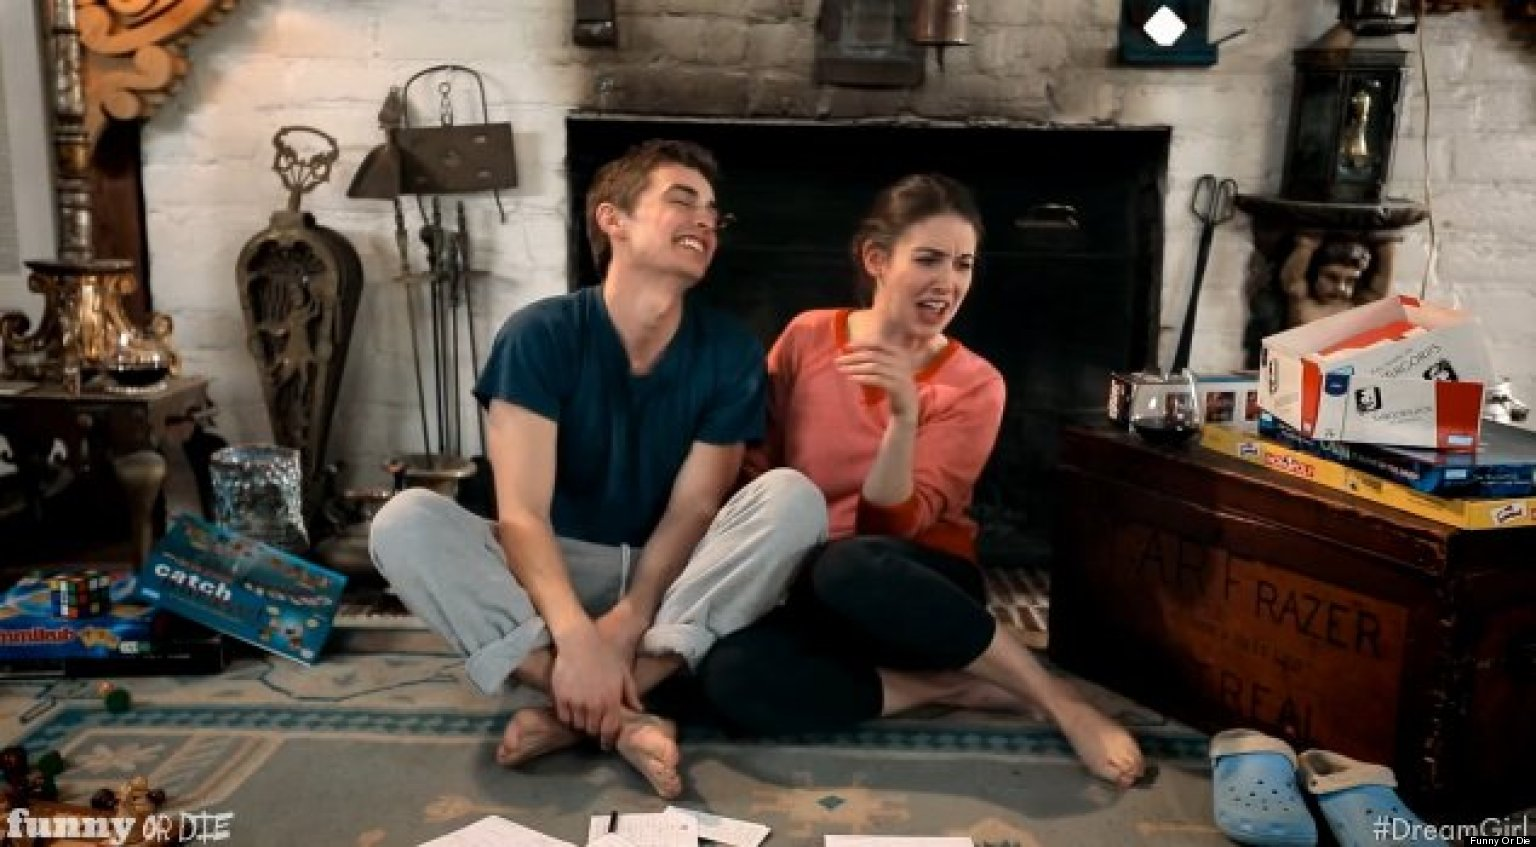 Alison Brie Is Dave Franco's Dream Girl, Sort Of (VIDEO)